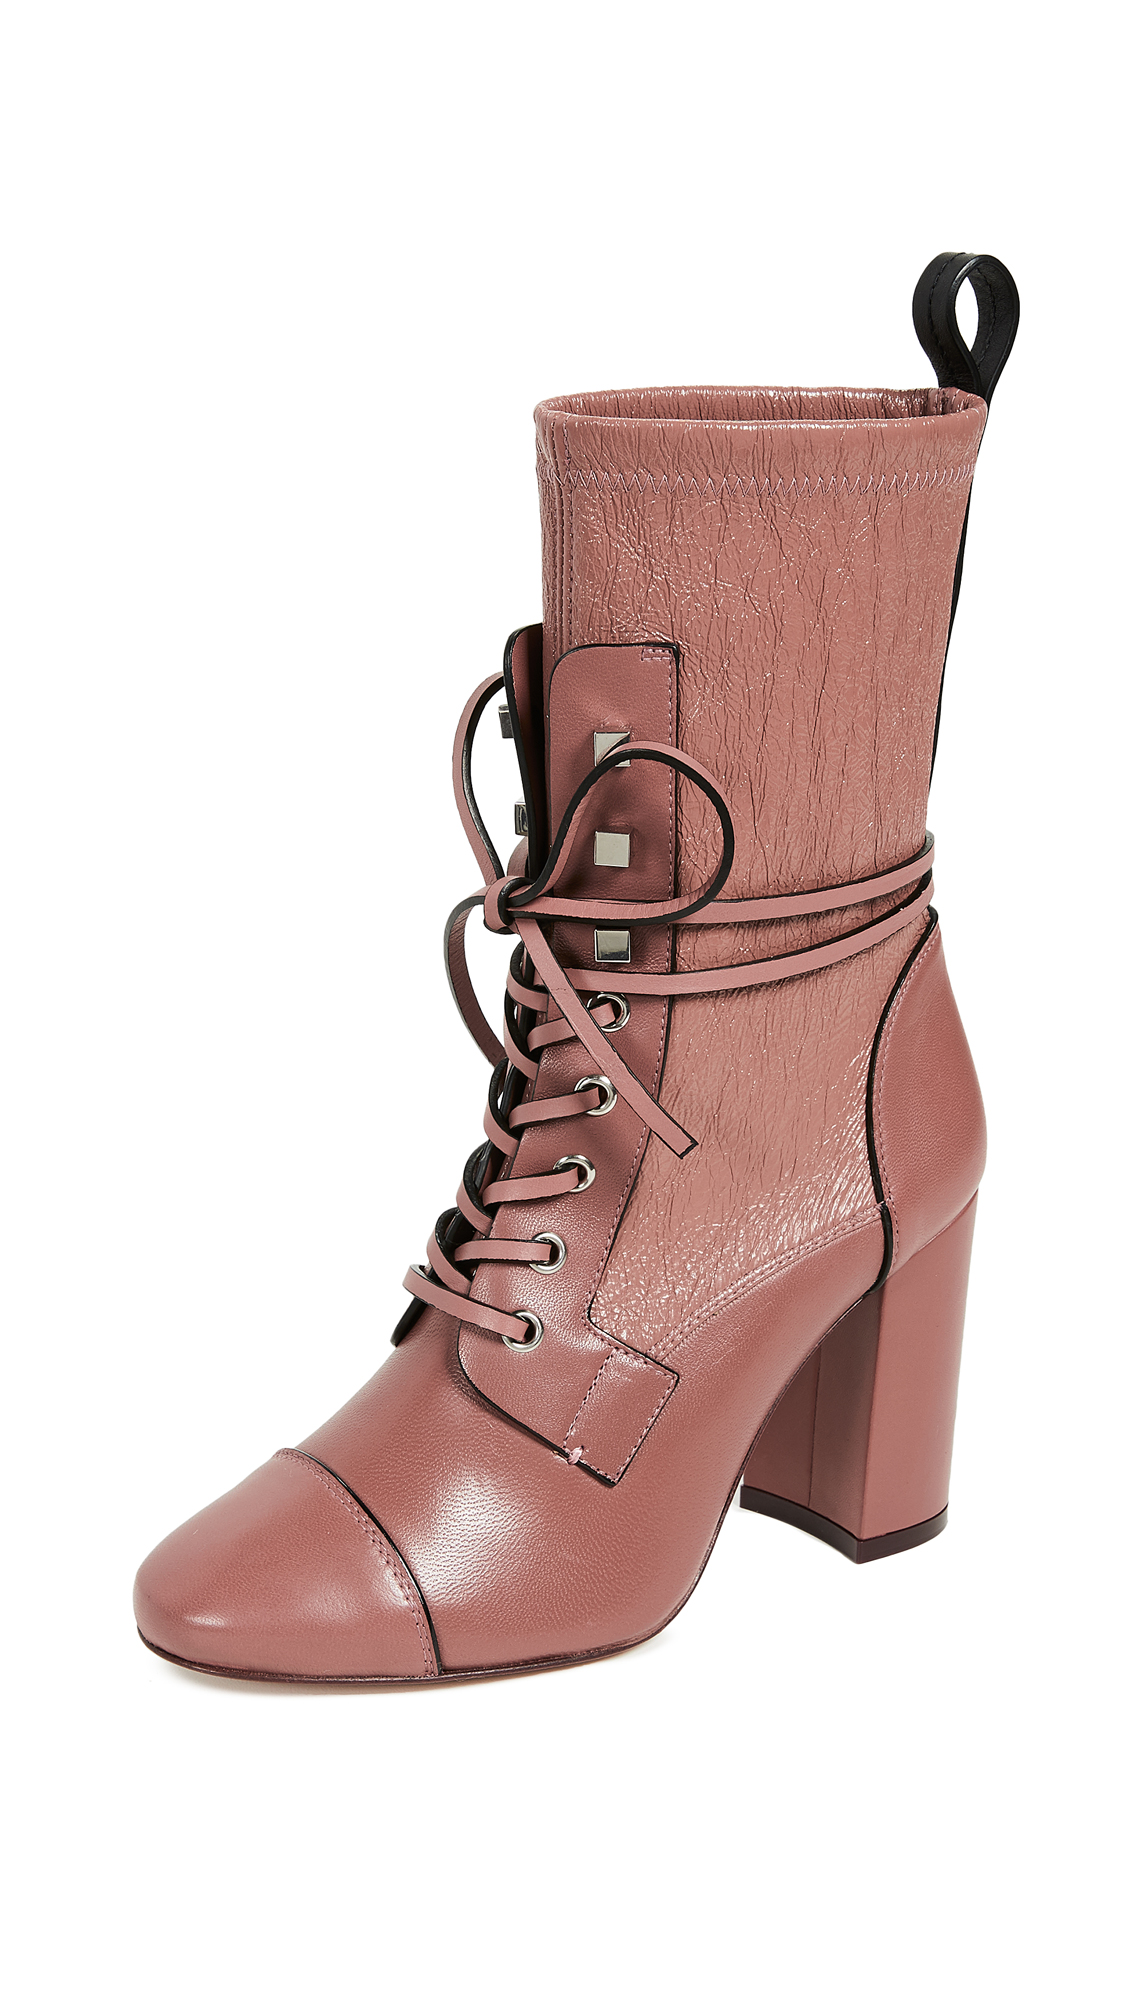 Stuart Weitzman Veruka Boots - Rose Clay